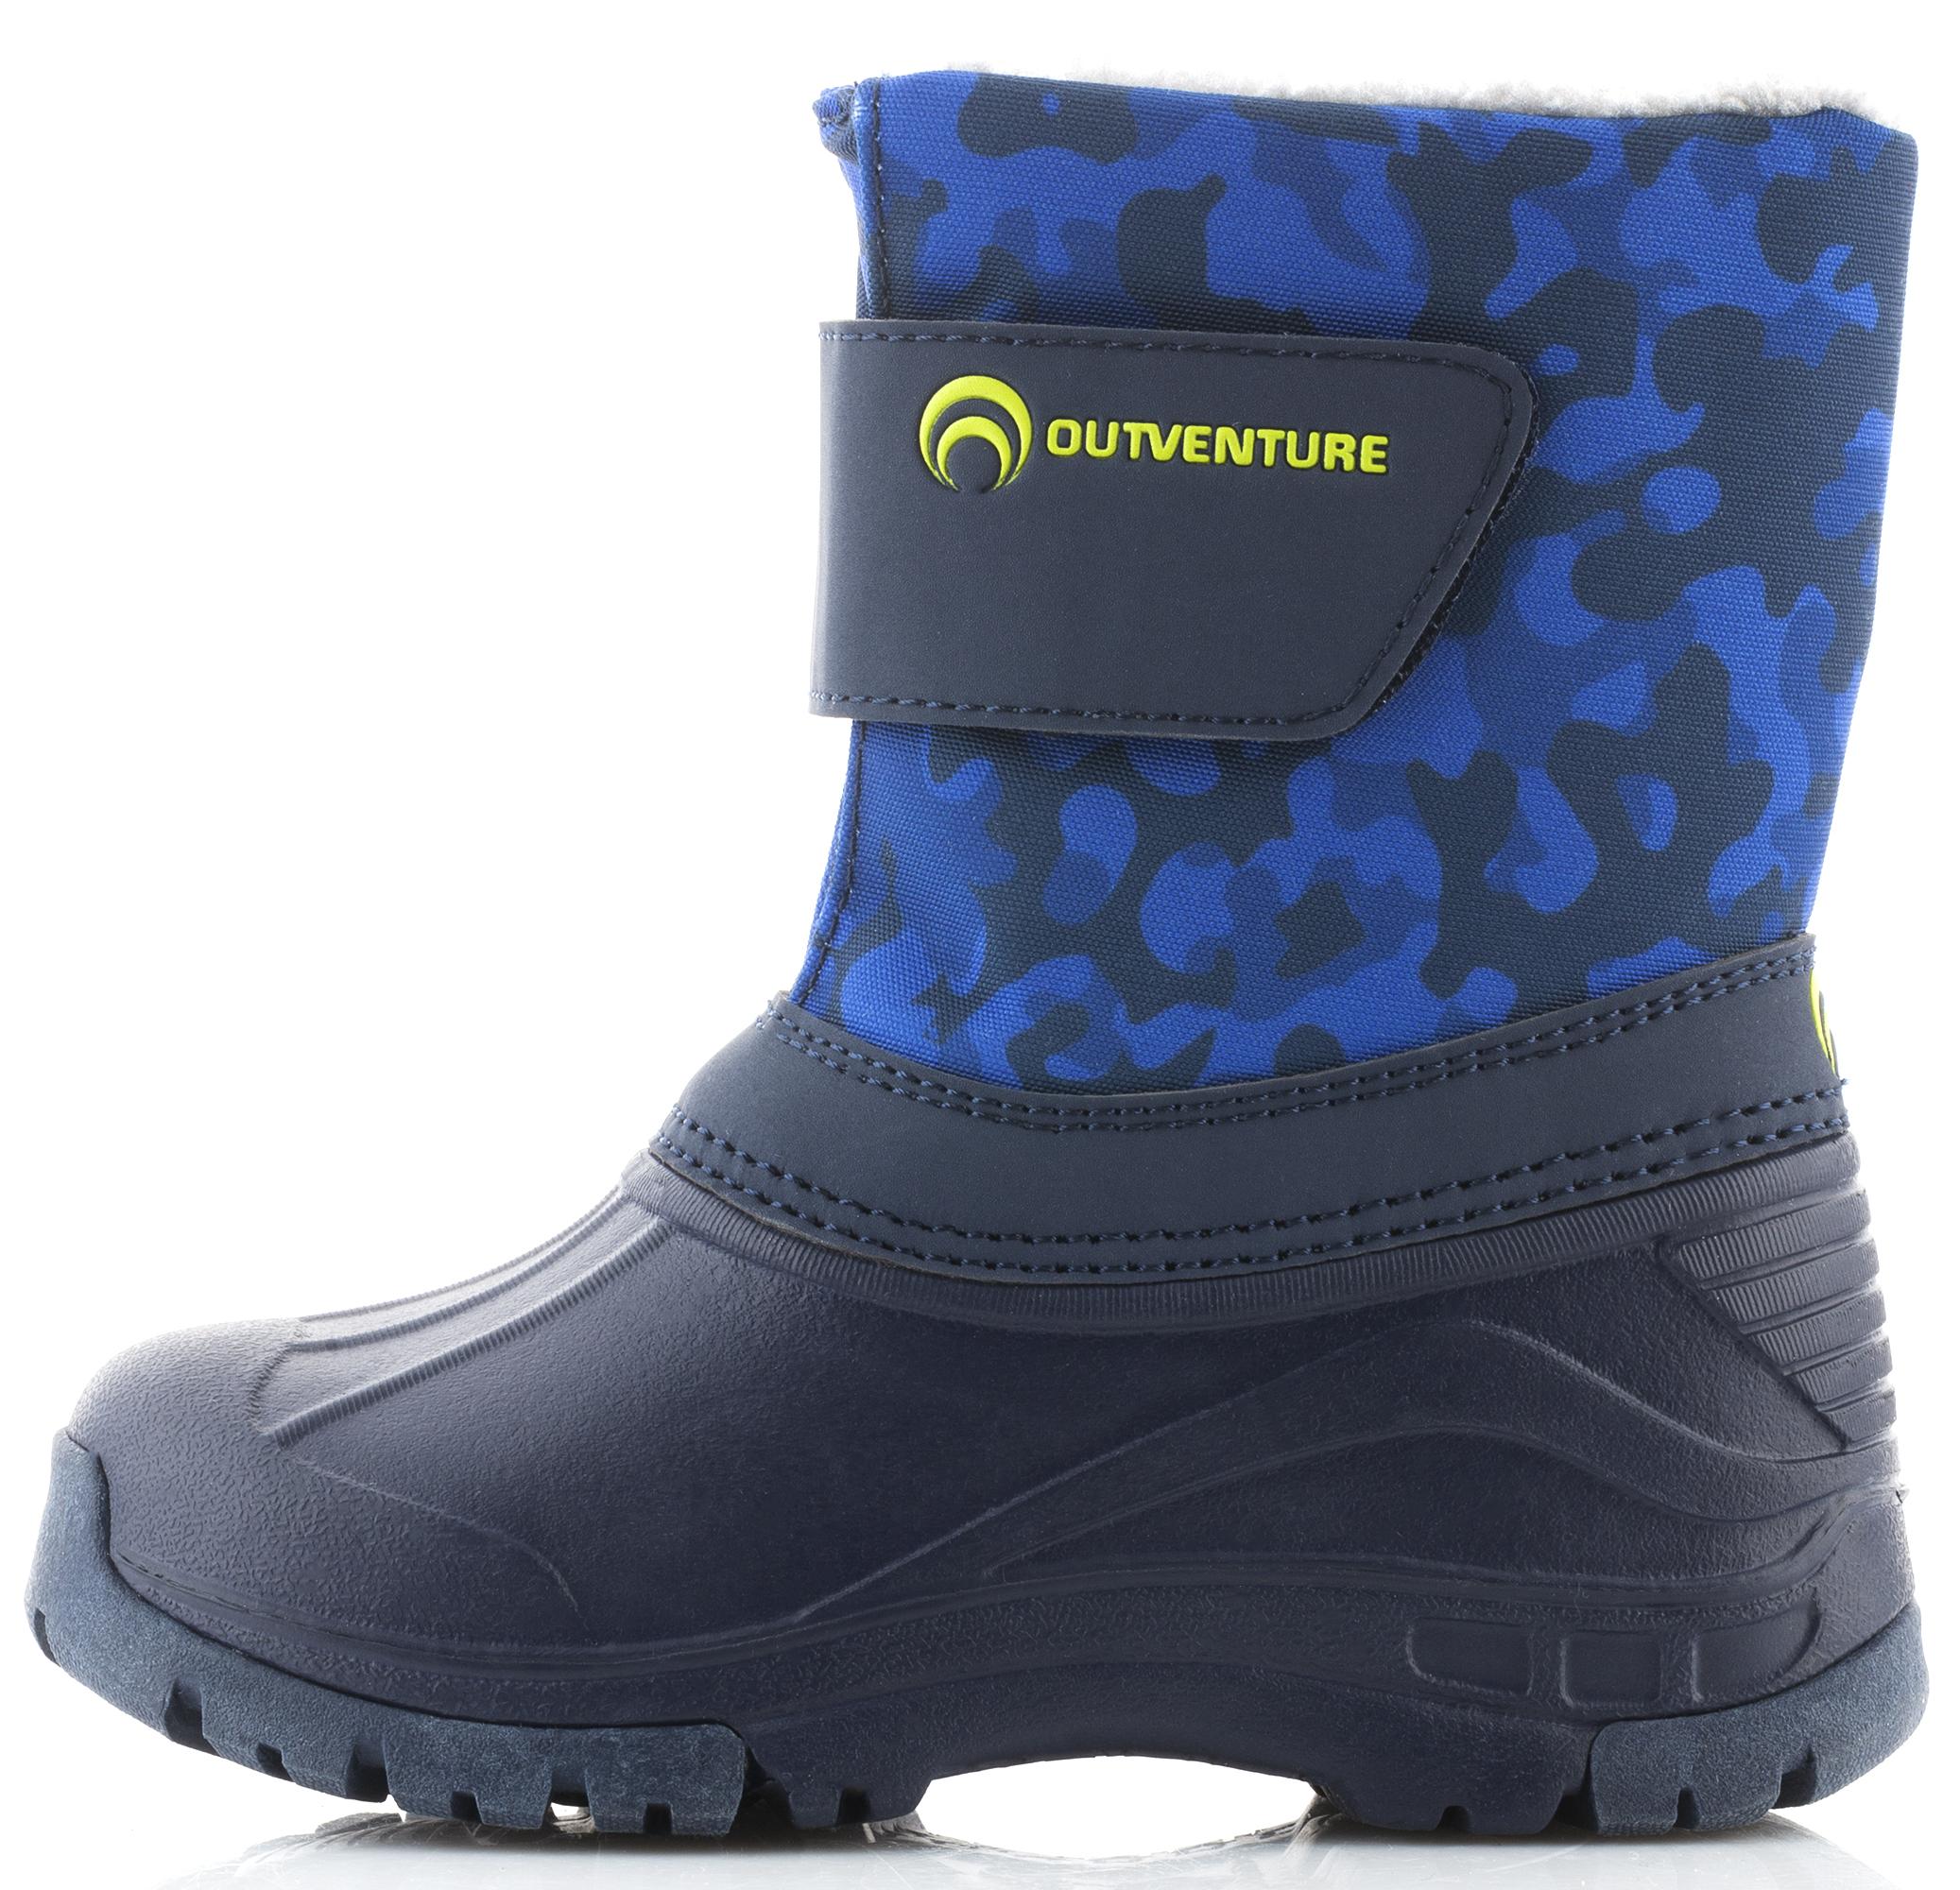 Outventure Сапоги утепленные для мальчиков Outventure Winner outventure ботинки утепленные для мальчиков outventure watersnow